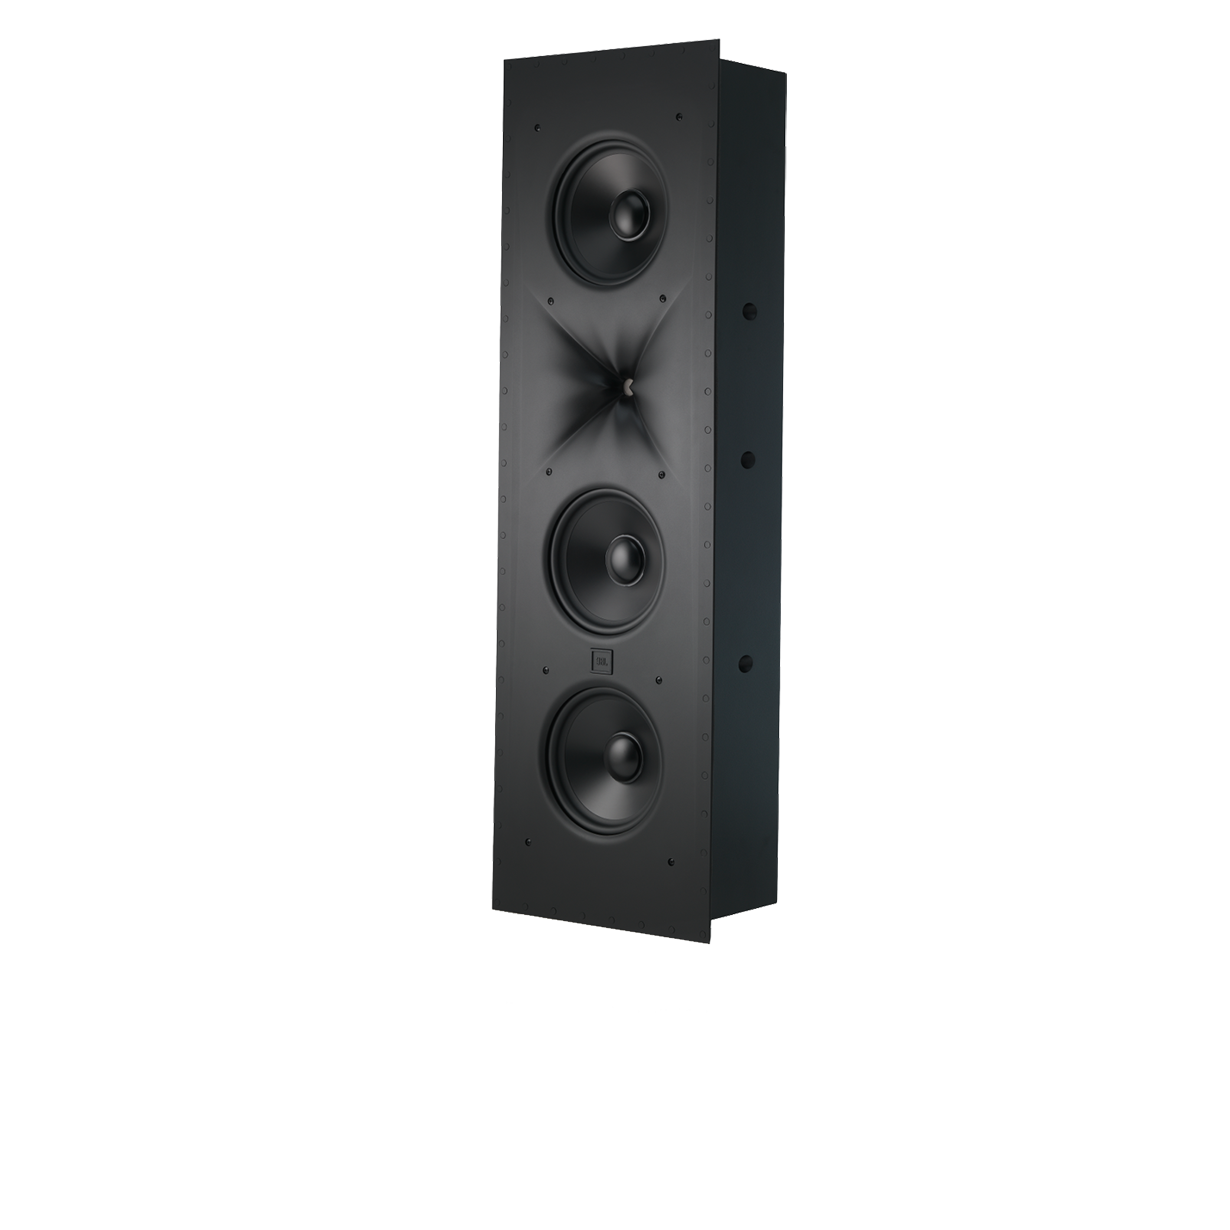 SCL-2 - Black - 2.5-Way Triple 8-inch (200mm) In-wall Loudspeaker - Hero